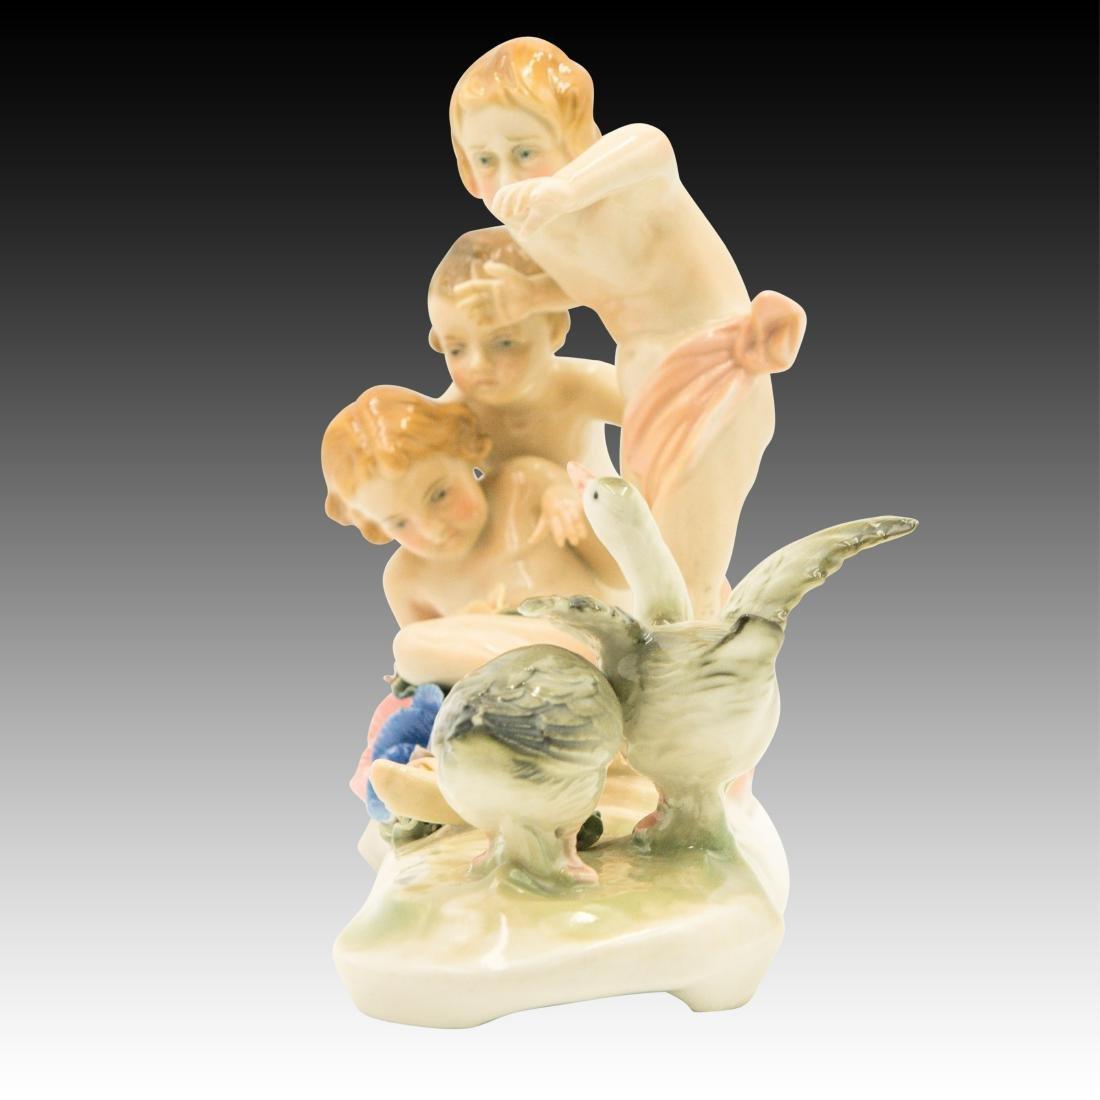 Karl Ens Figurine Children versus the Ducks - 4